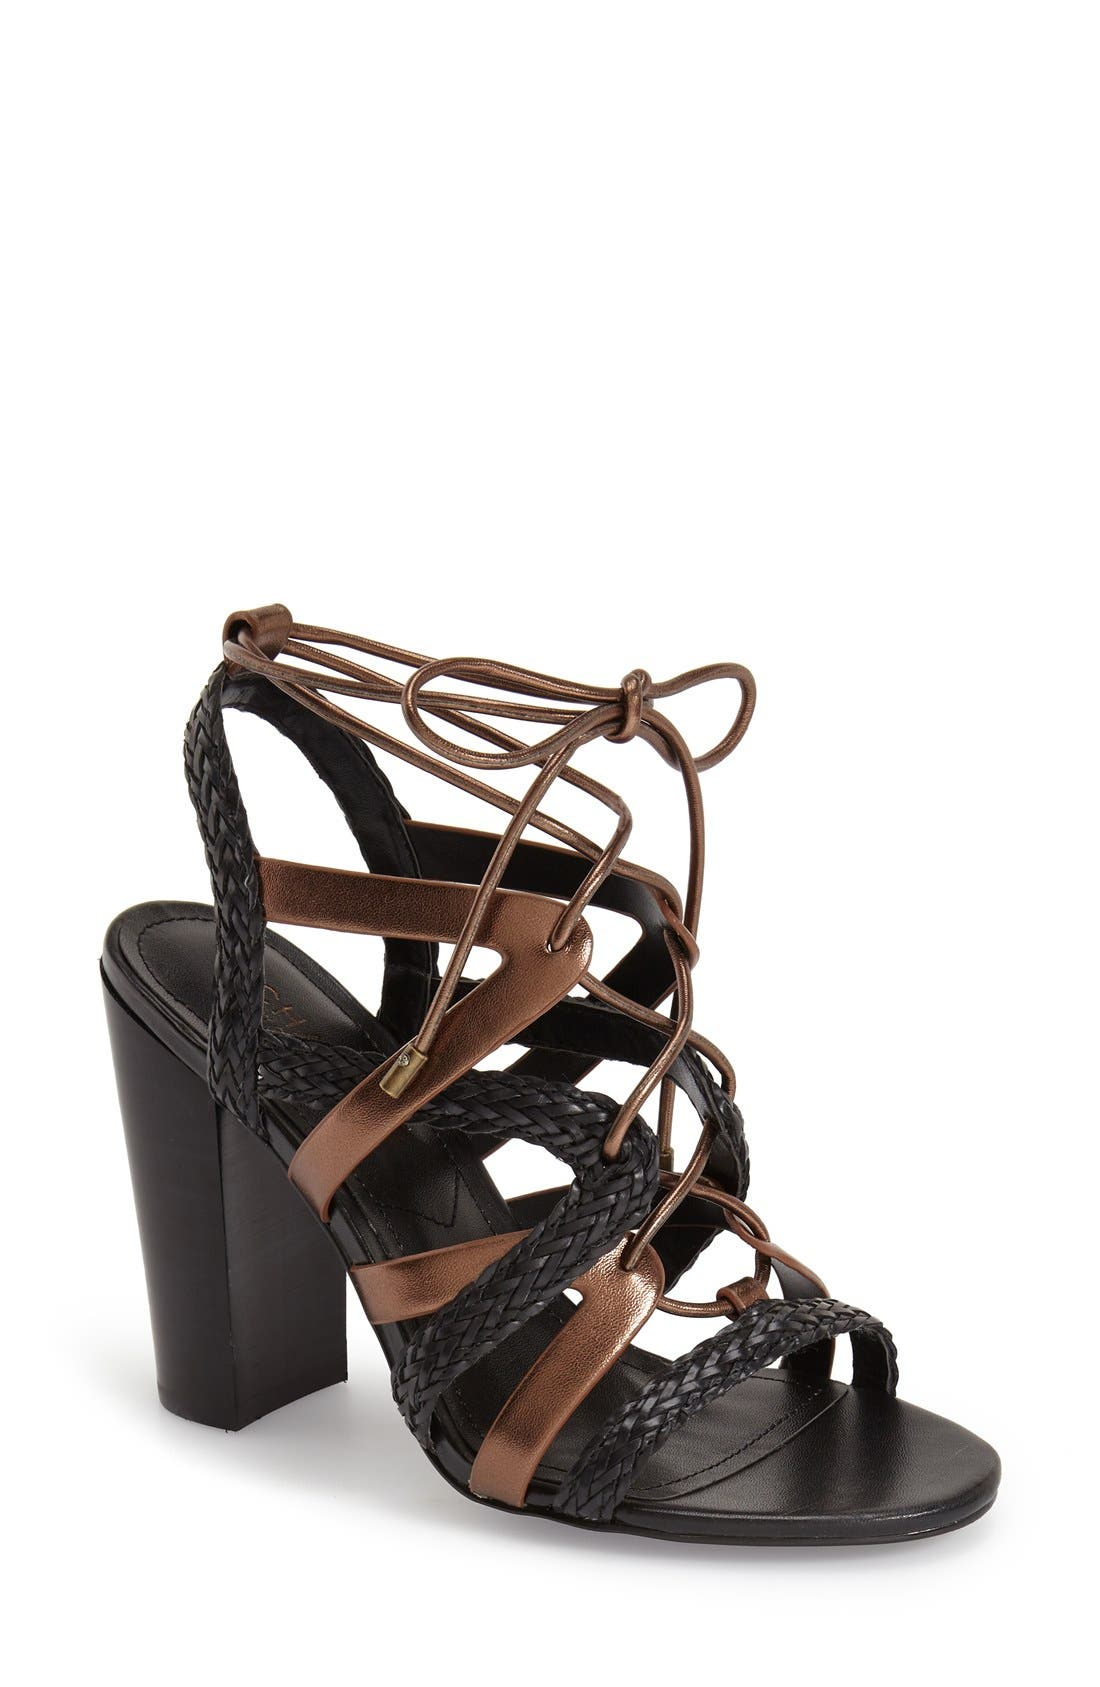 Main Image - Charles by Charles David 'Greensboro' Lace-Up Block Heel Sandal (Women)